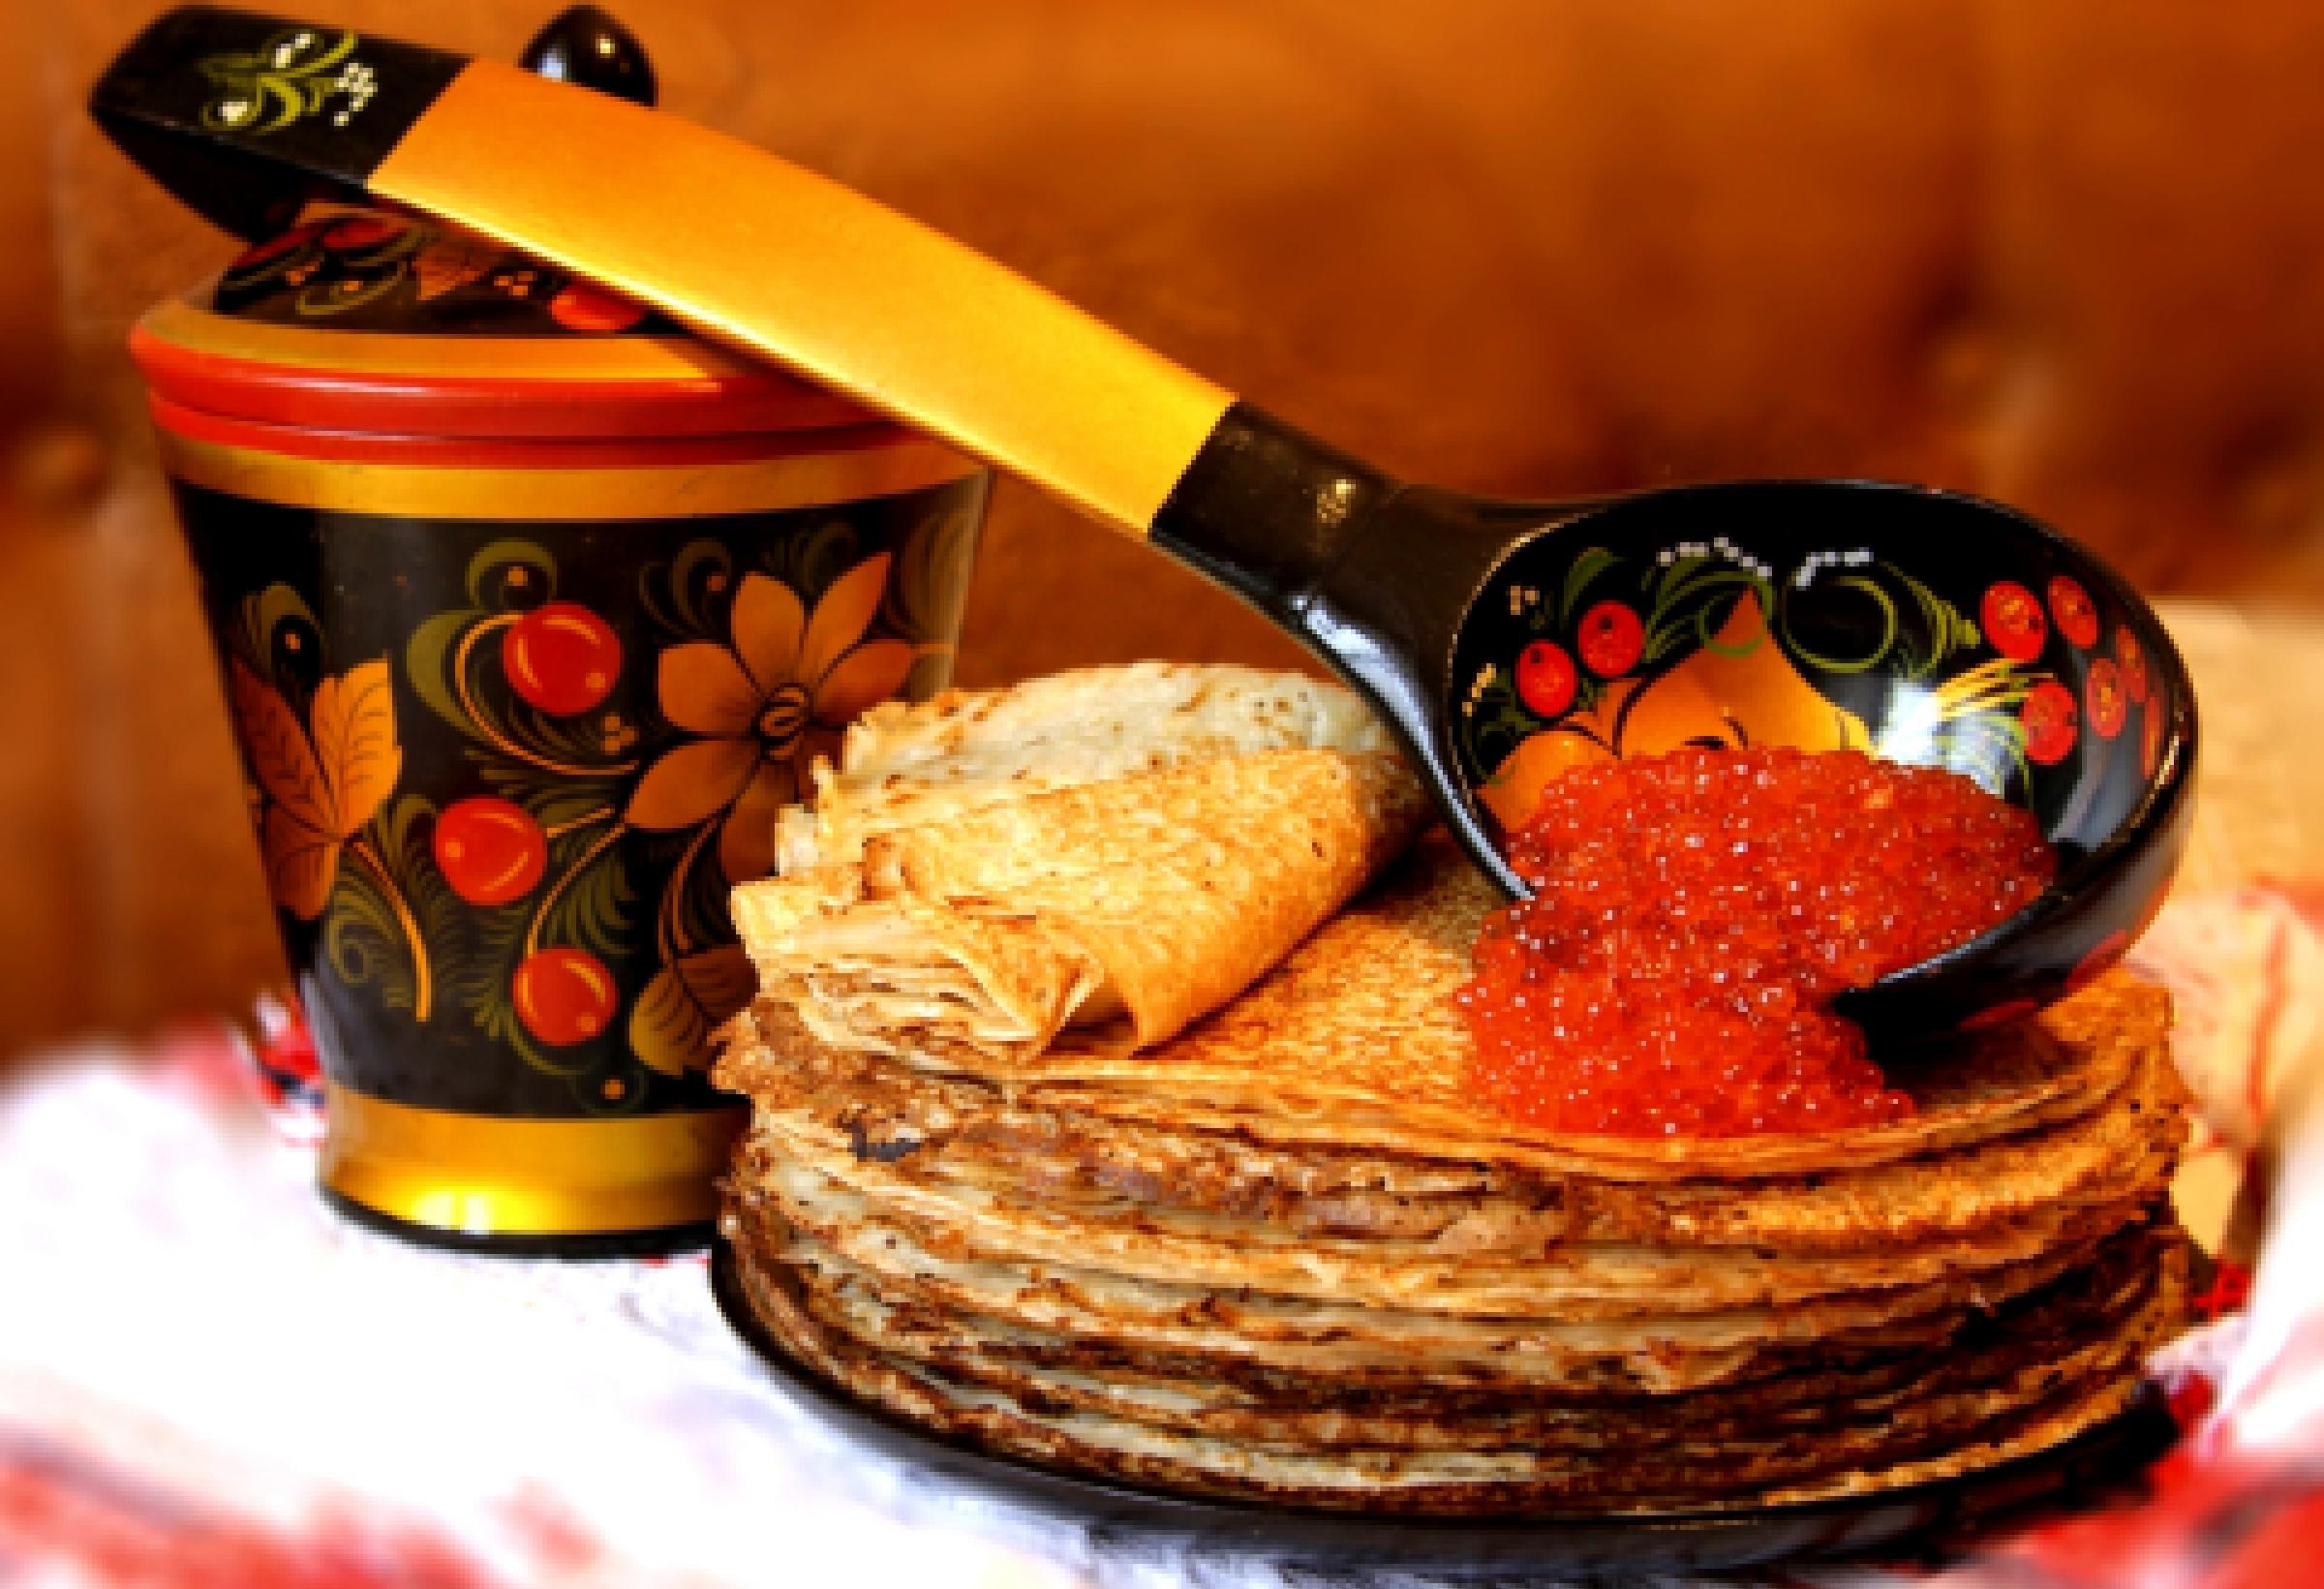 полтора-два года открытка русская еда самая простая